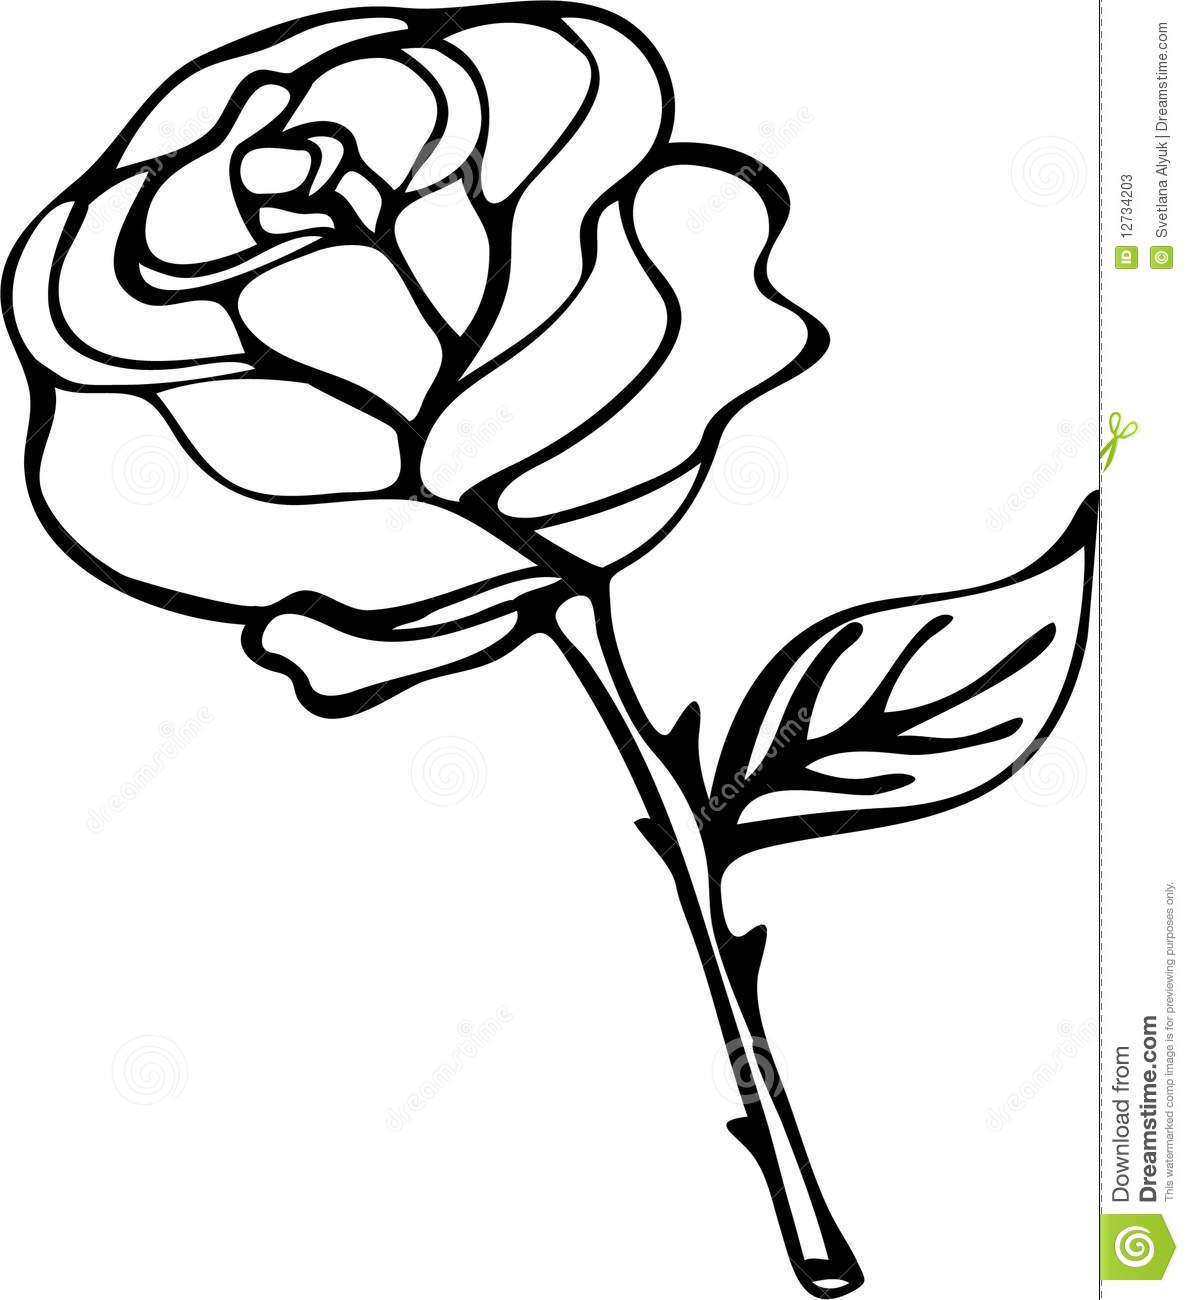 white rose clip art free clipart panda free clipart images rh clipartpanda com white rose flower clip art white rose flower clip art